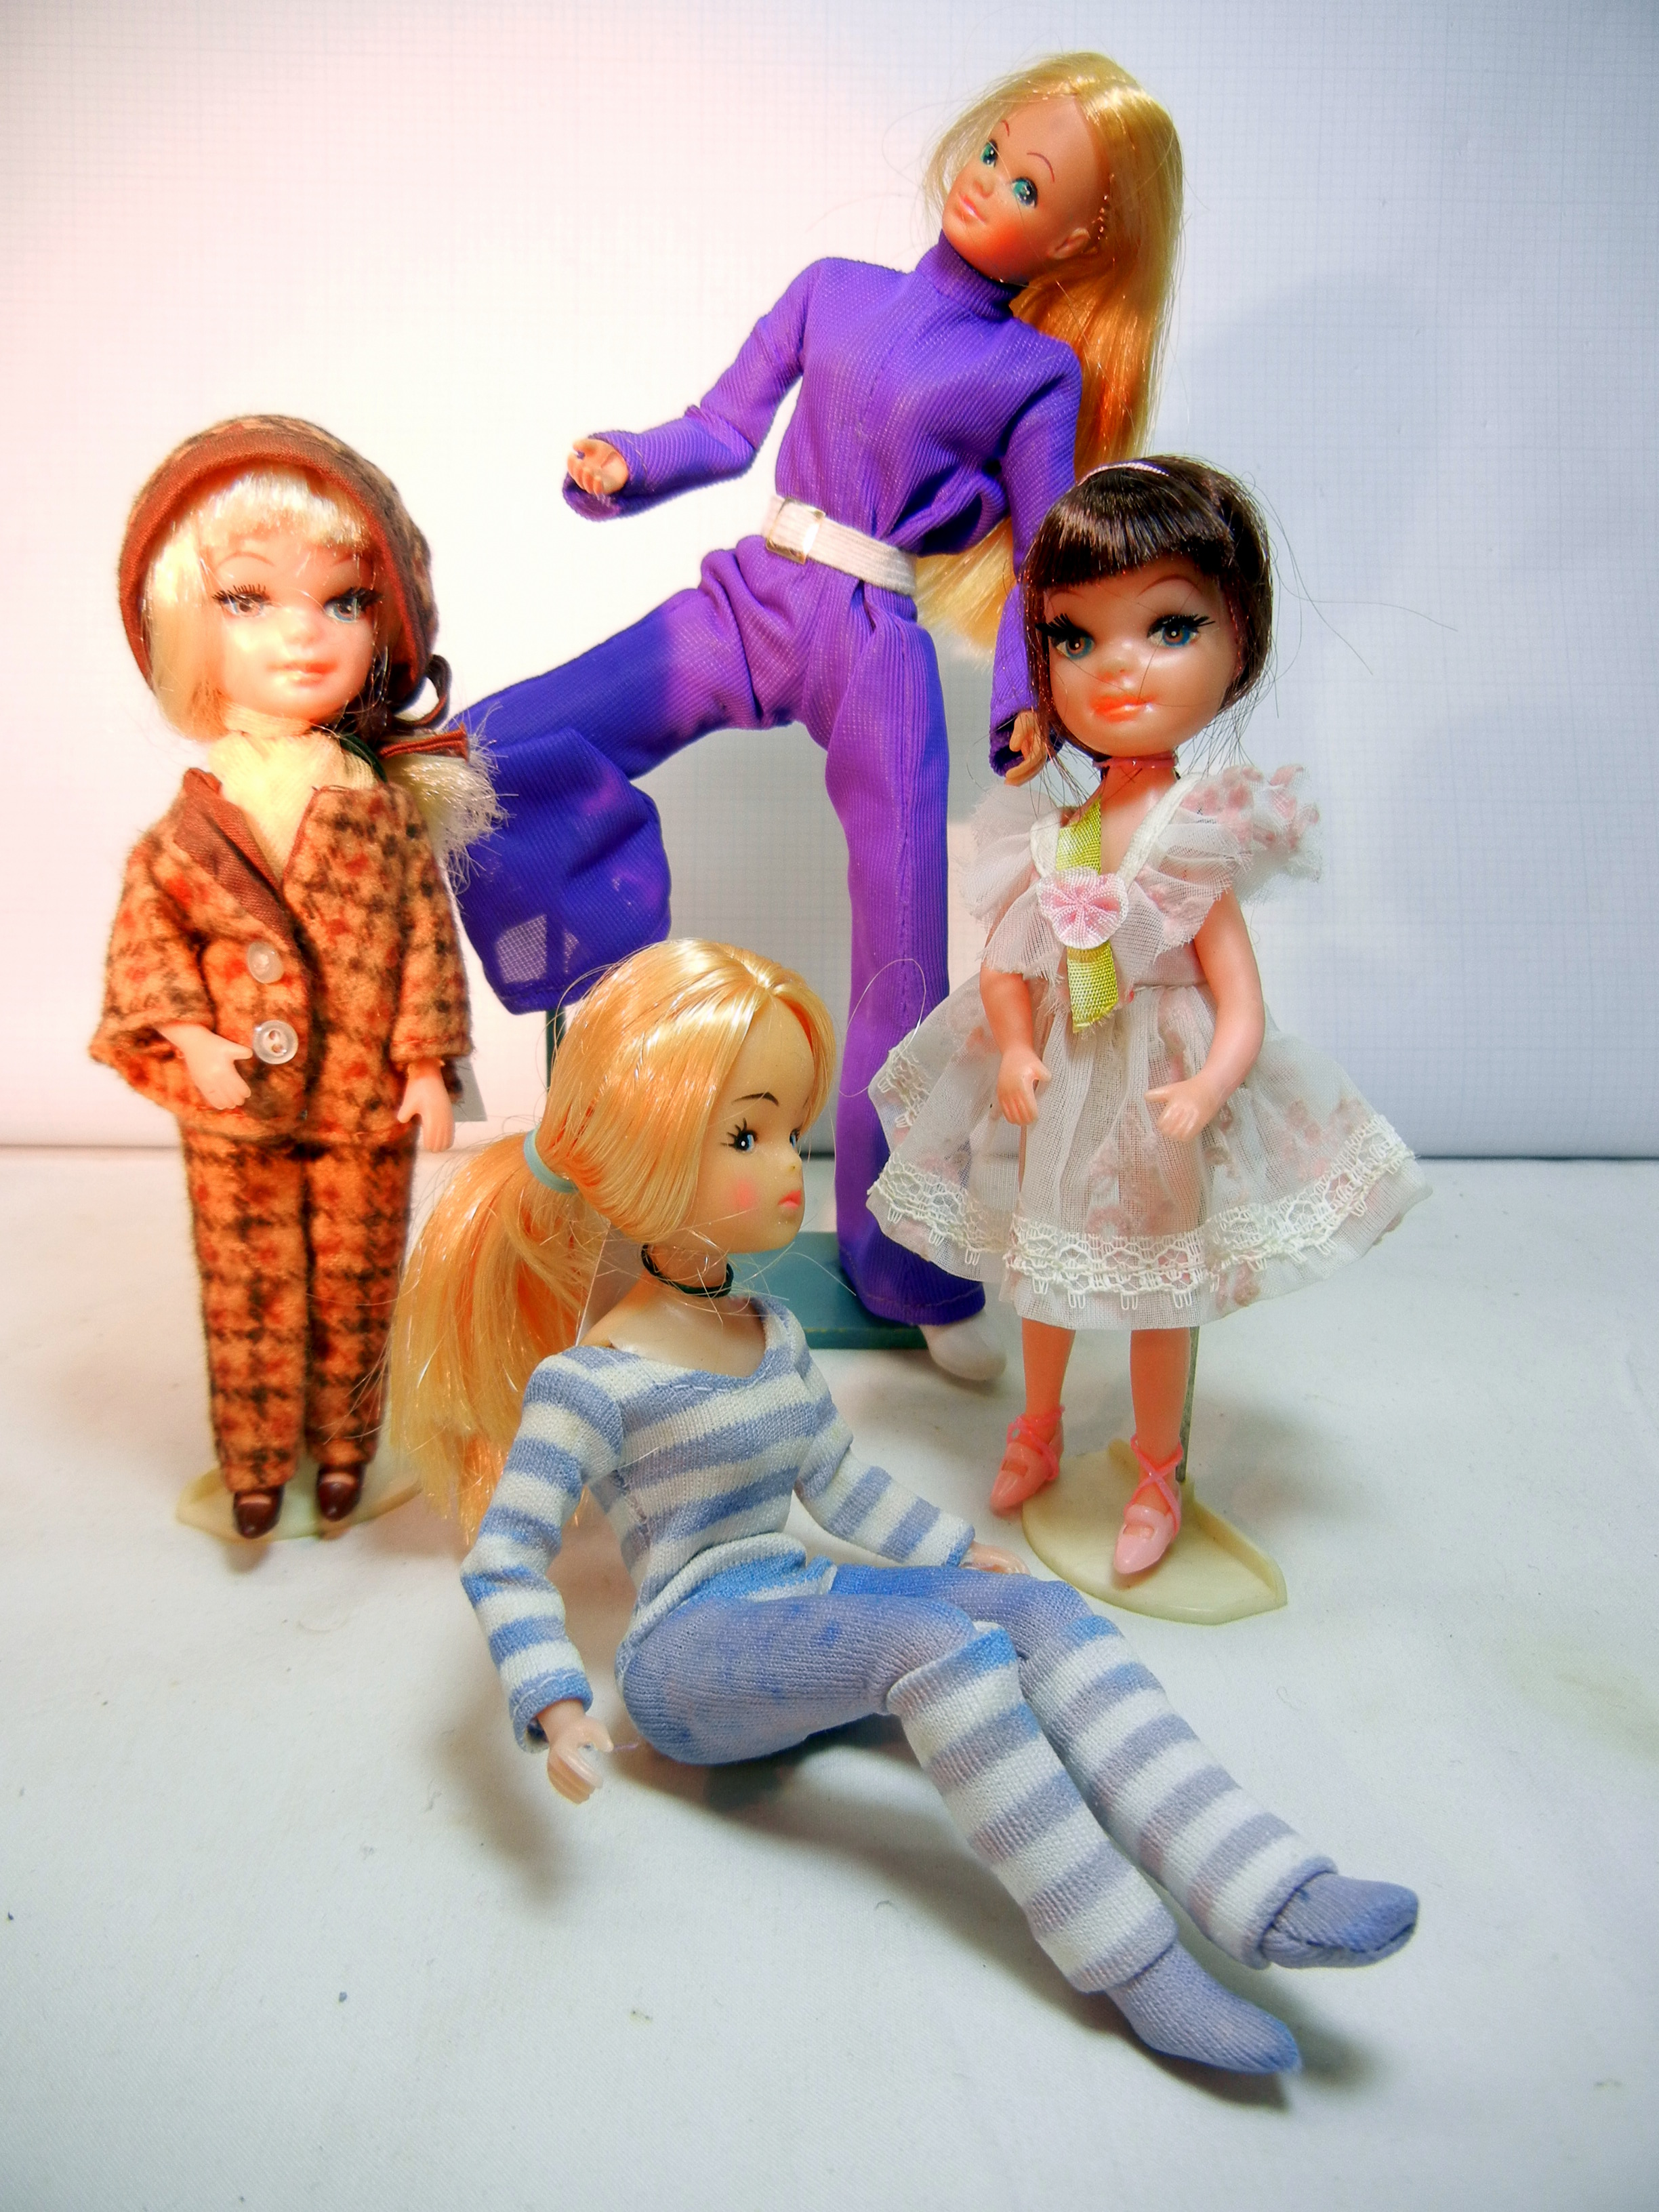 Dinah-mite Doll